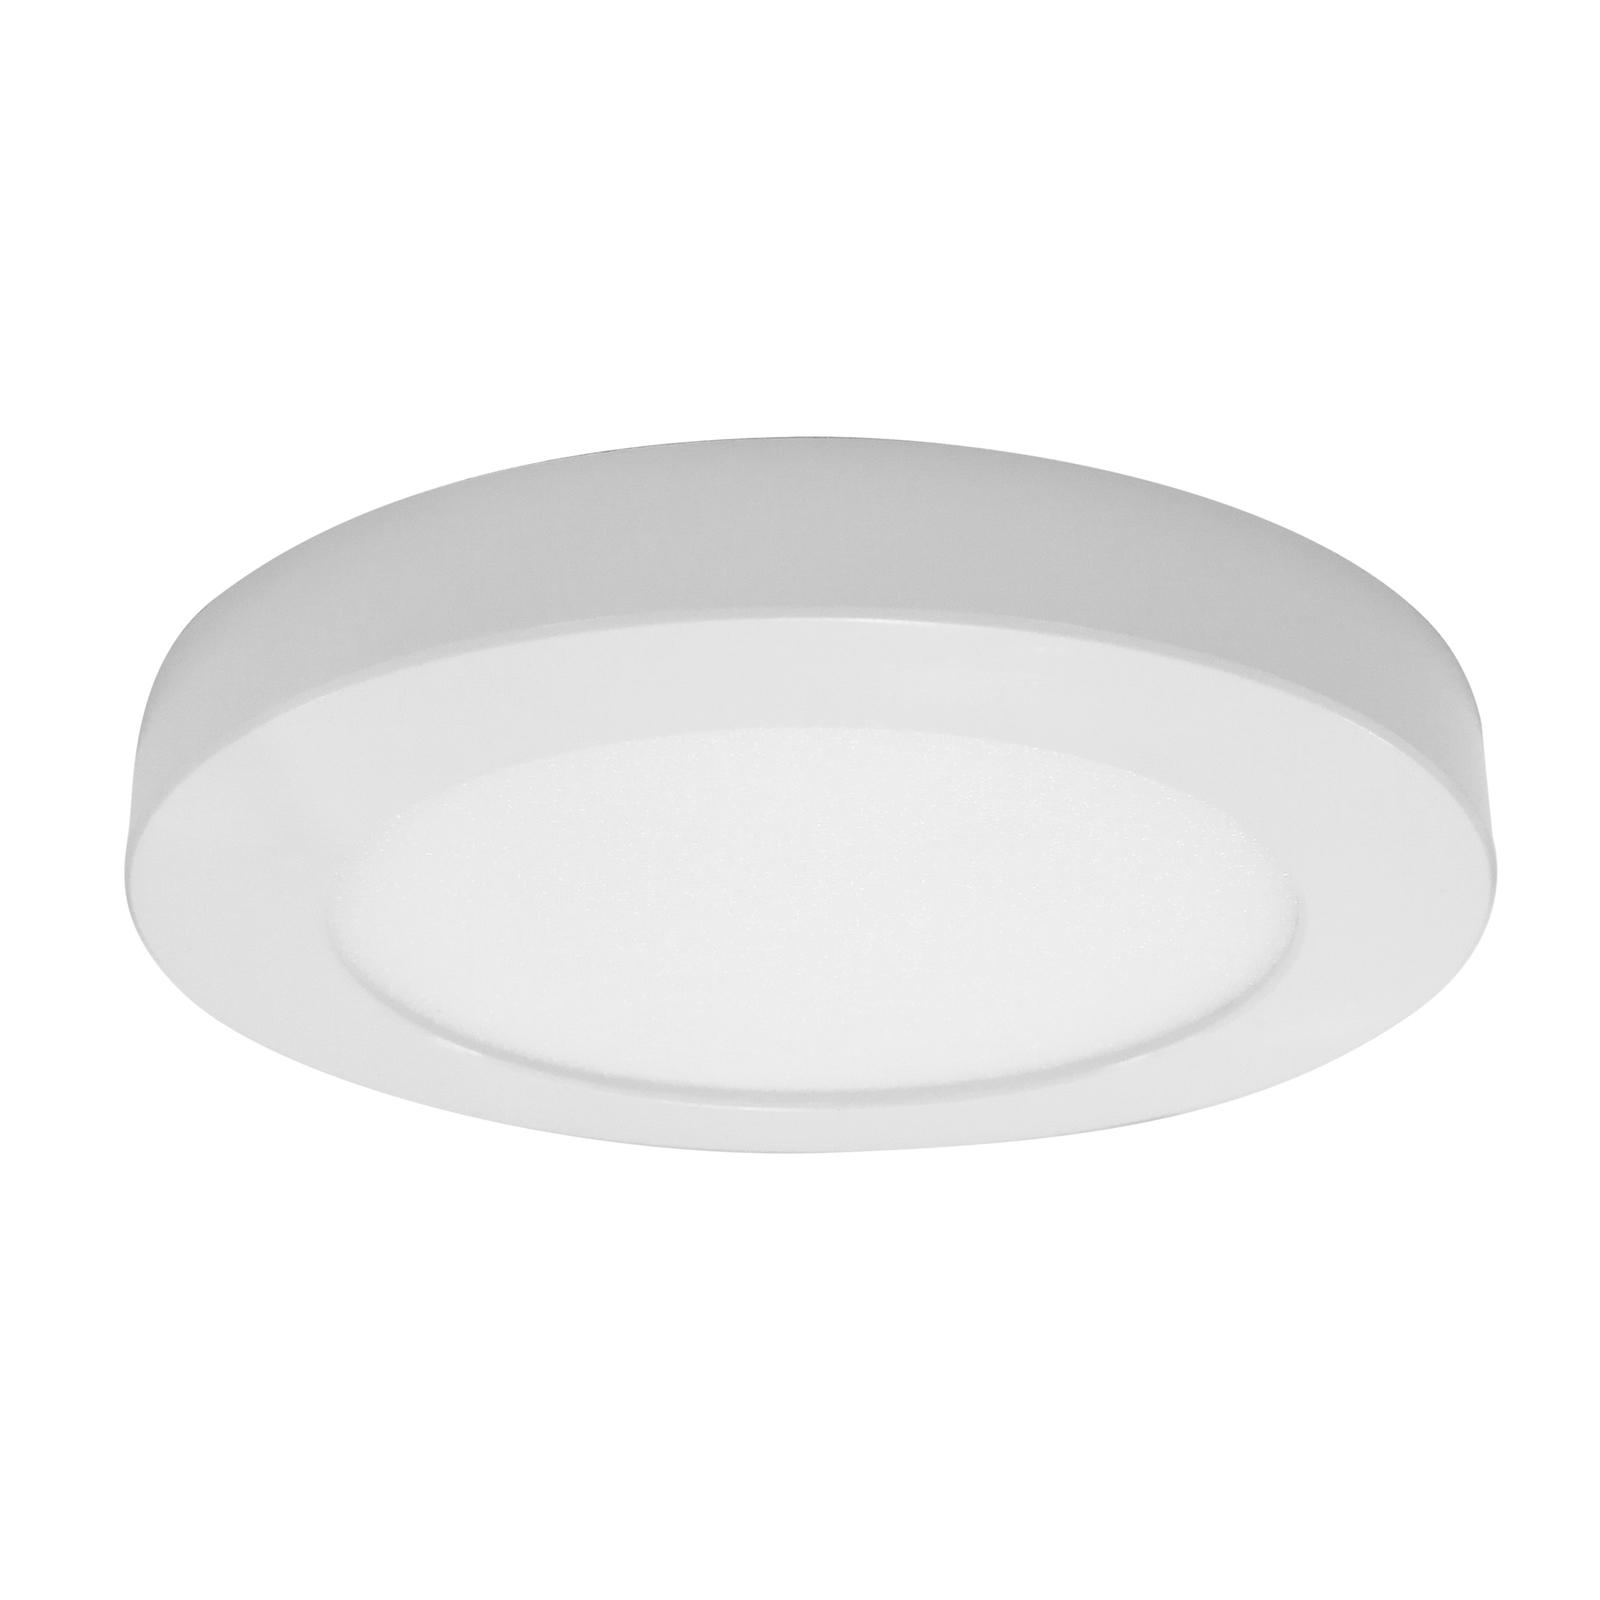 Prios Aureka LED-taklampe, sensor, 33 cm